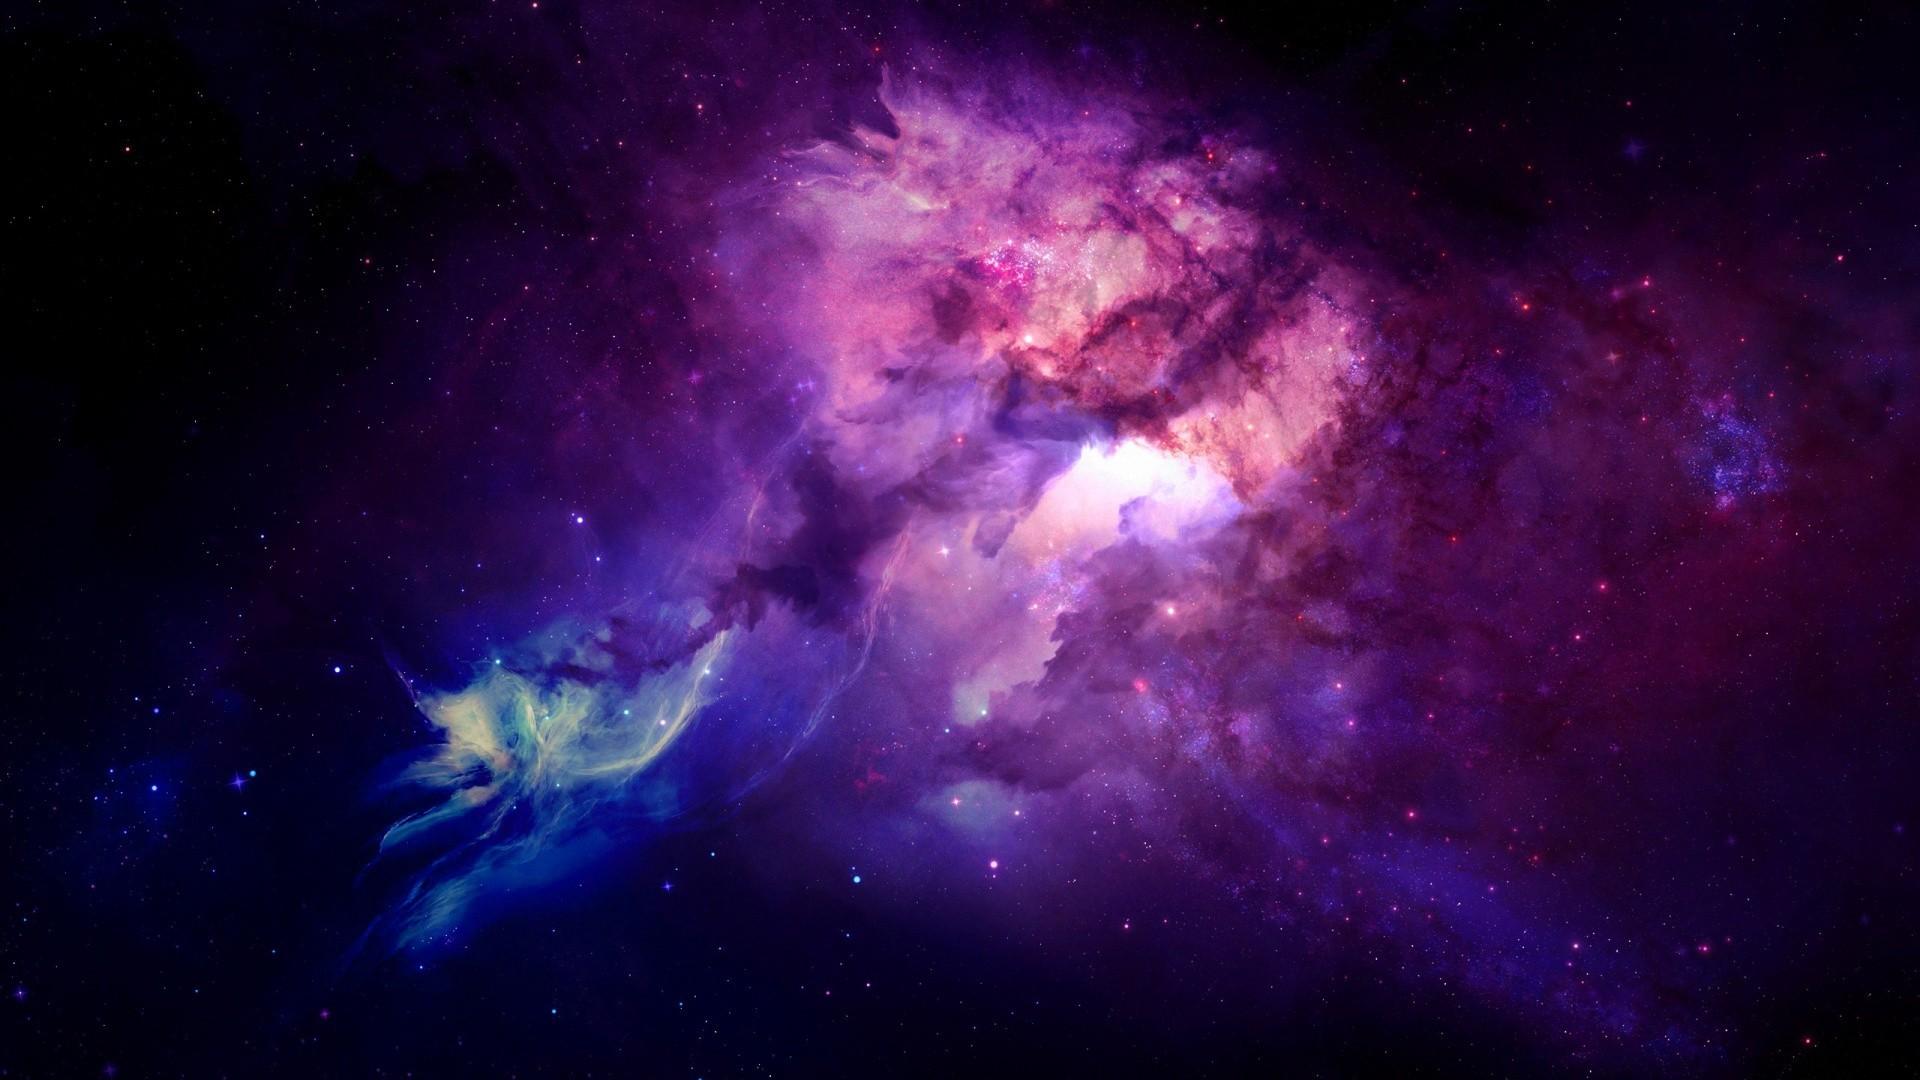 General 1920x1080 space galaxy universe space art nebula digital art